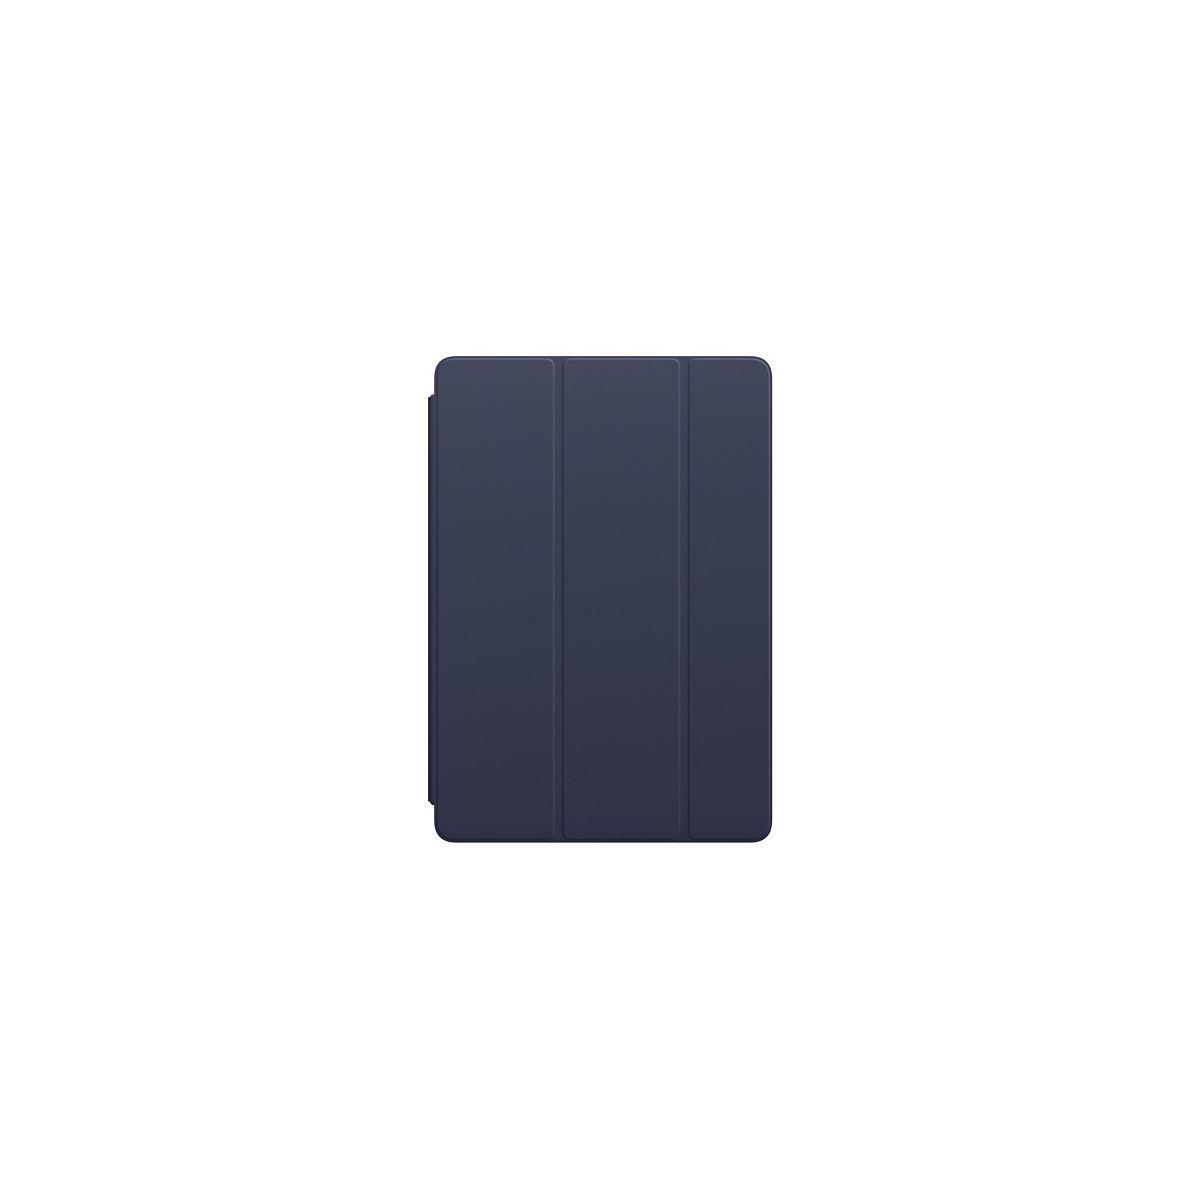 Folio apple smart cover ipad pro 10.5 bl (photo)